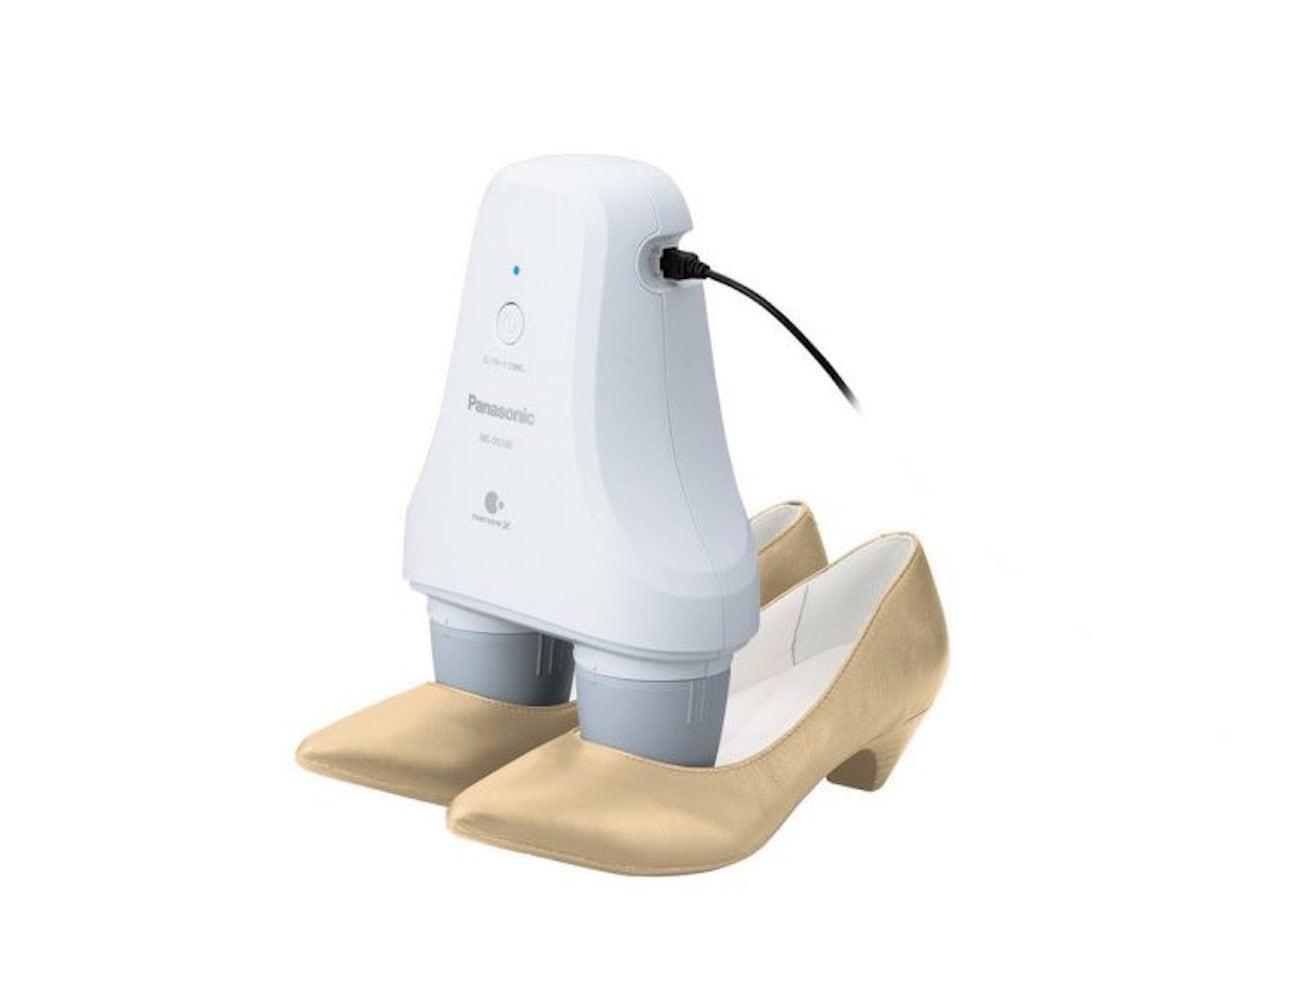 Panasonic MS-DS100 Electric Shoe Deodorizer